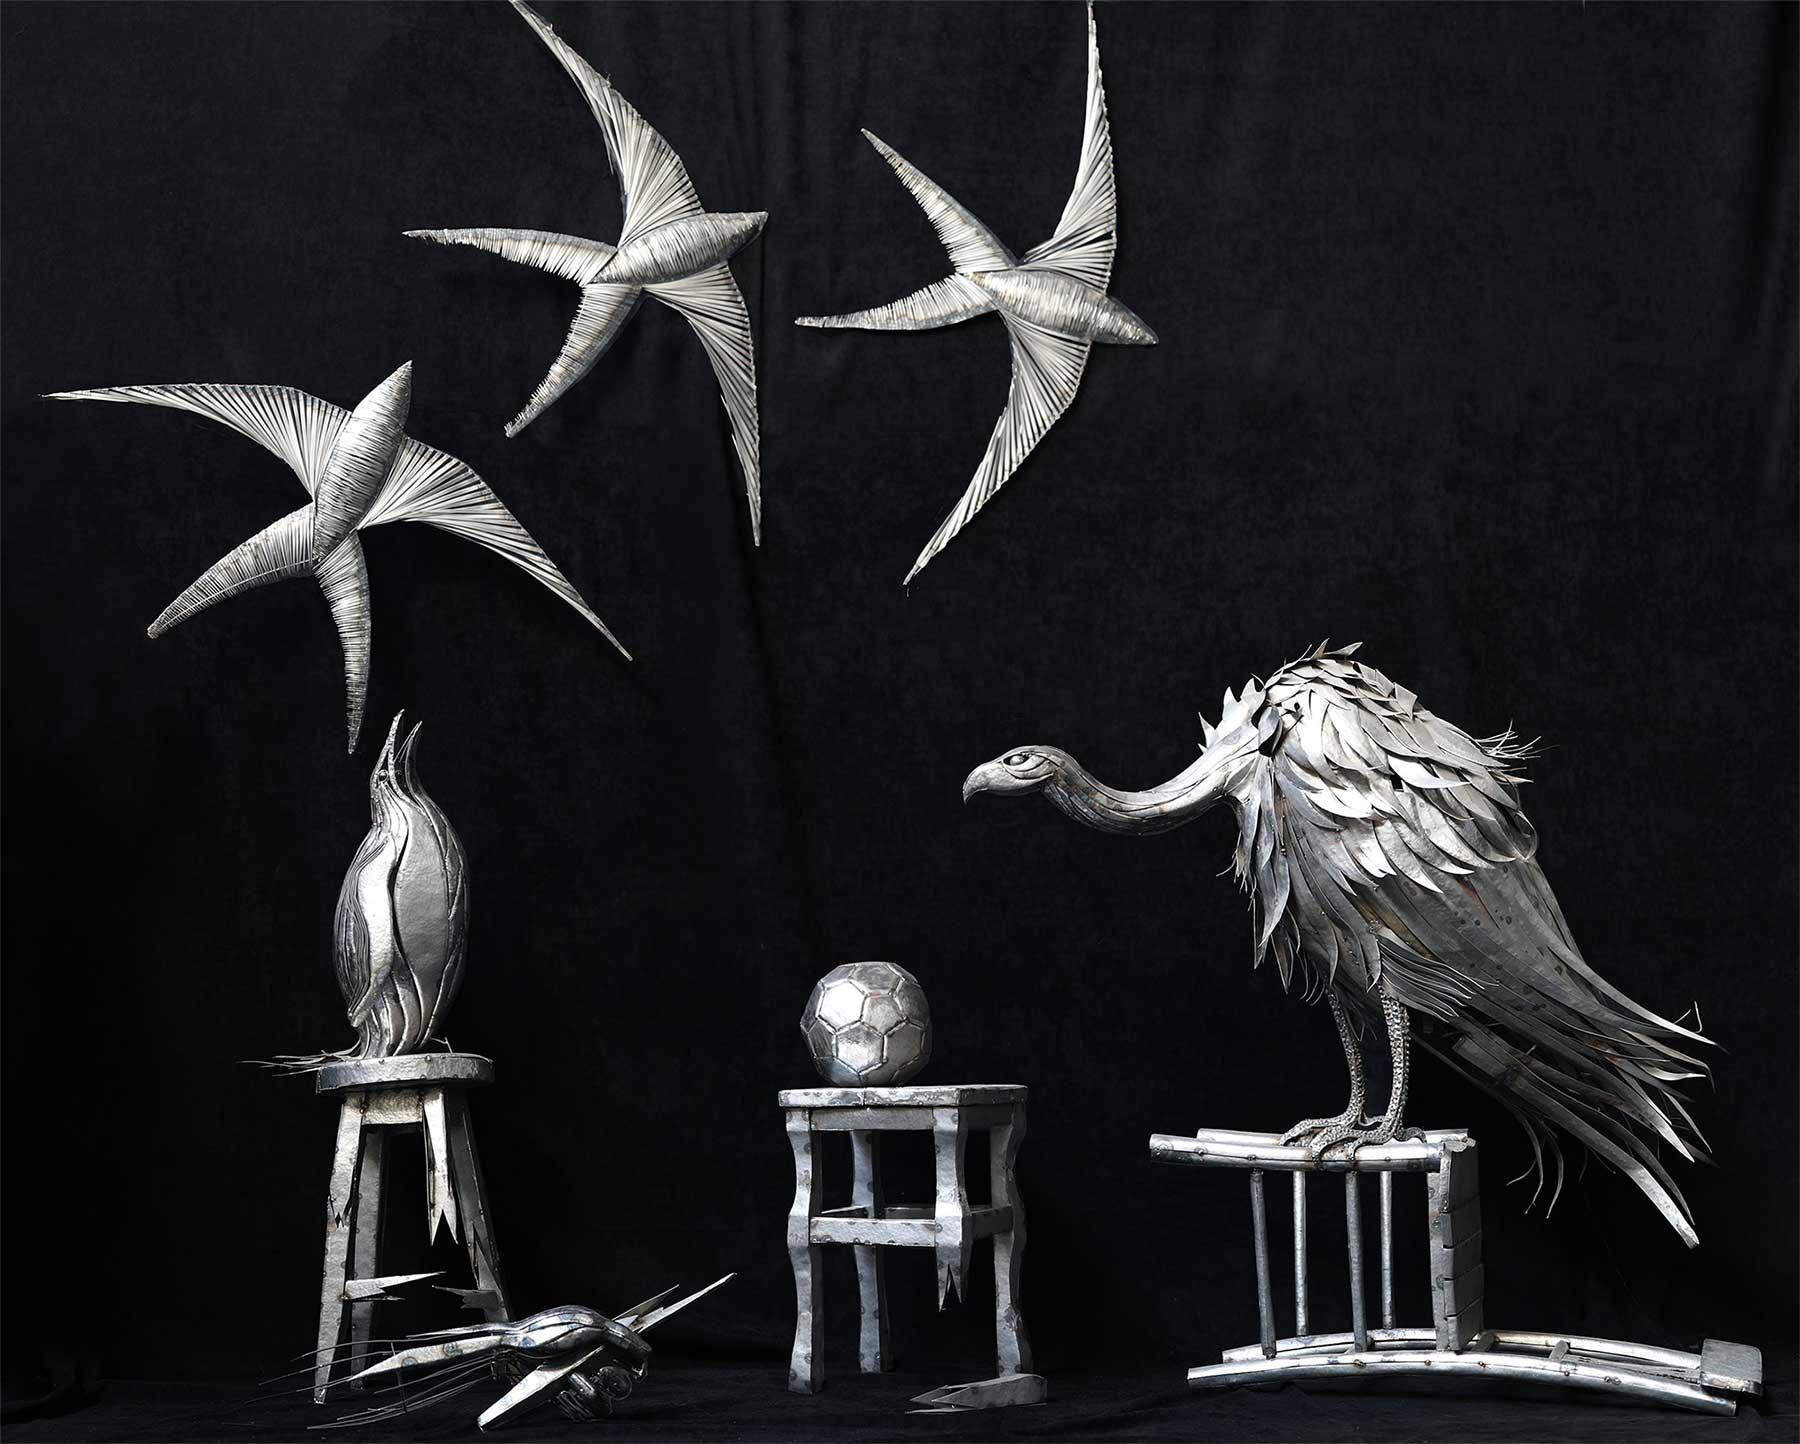 Geniale Altmetall-Skulpturen von Selçuk Yılmaz selcuk-yilmaz-metallskulpturen-2020_06